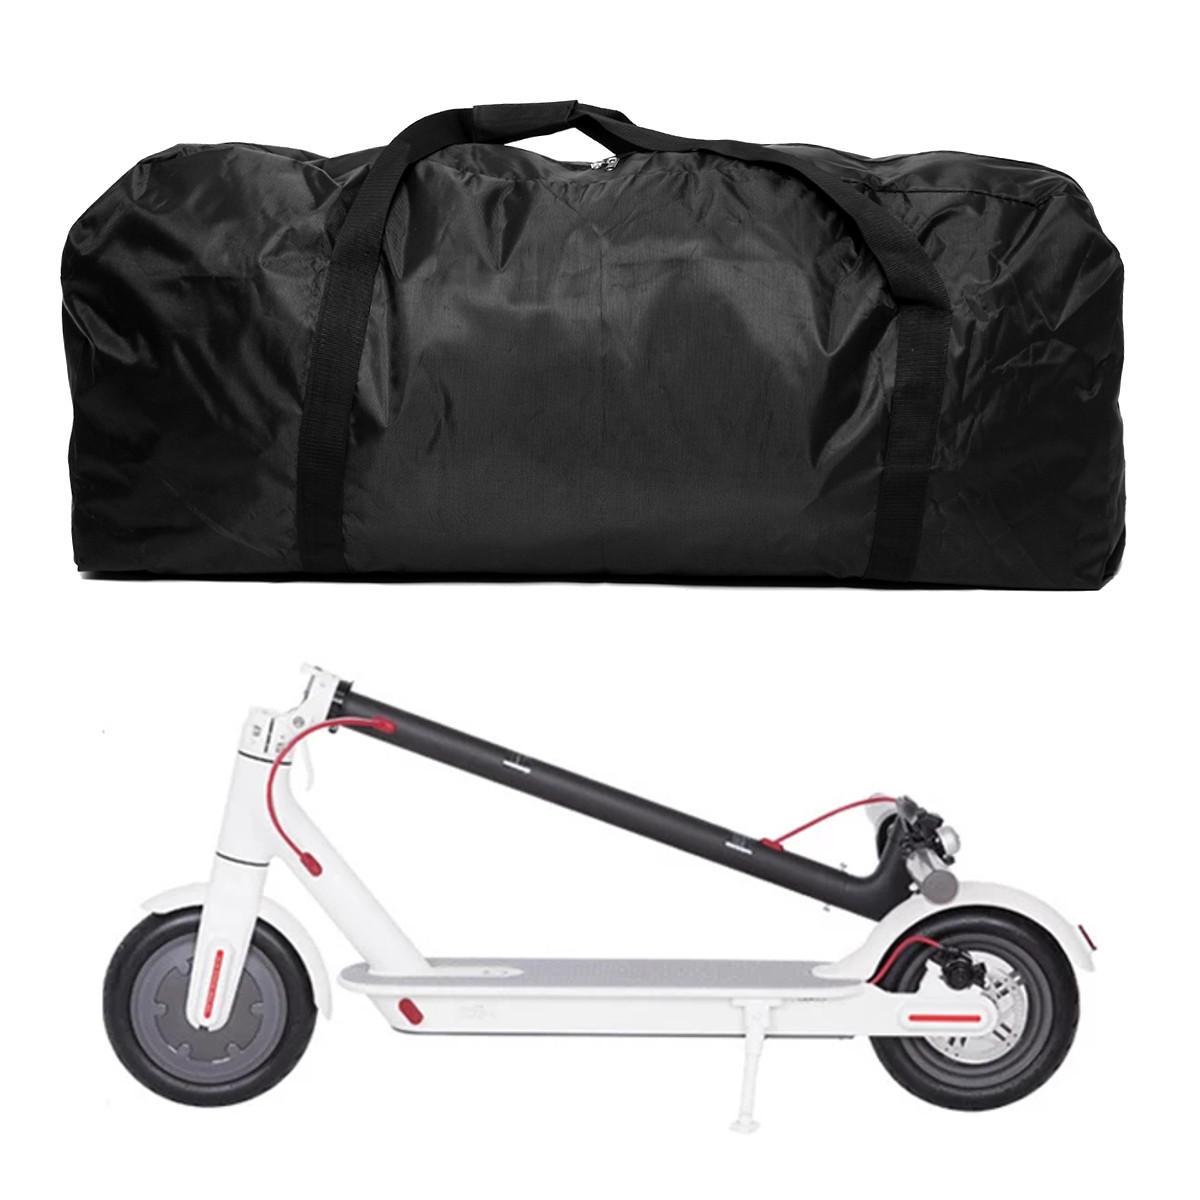 Folding Handbag Storage Bag Portable Carry Bag For XIAOMI Mijia M365  Electric Scooter